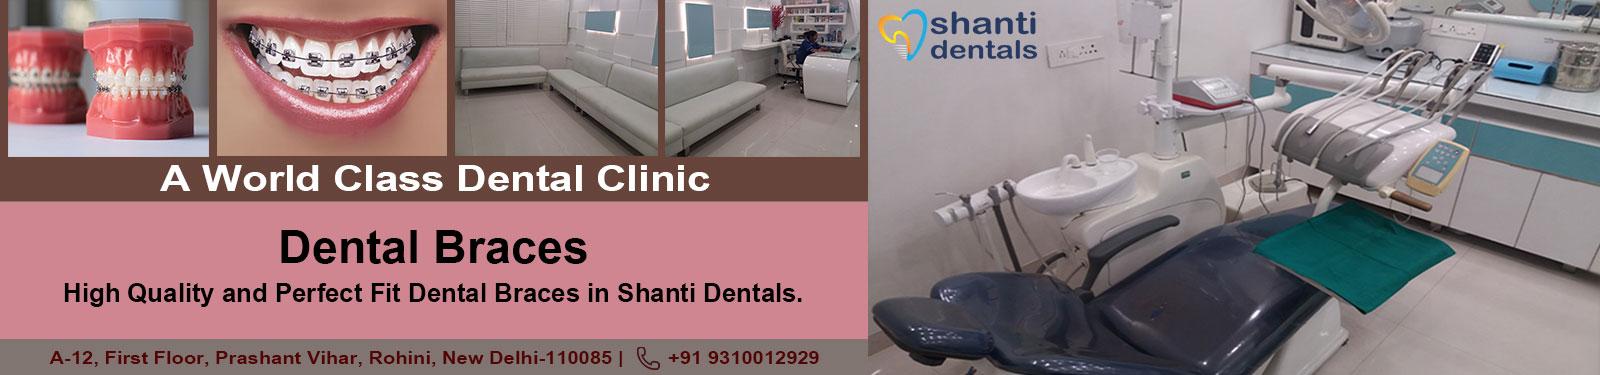 Dental Braces Care in Rohini Delhi By Shanti Dentals